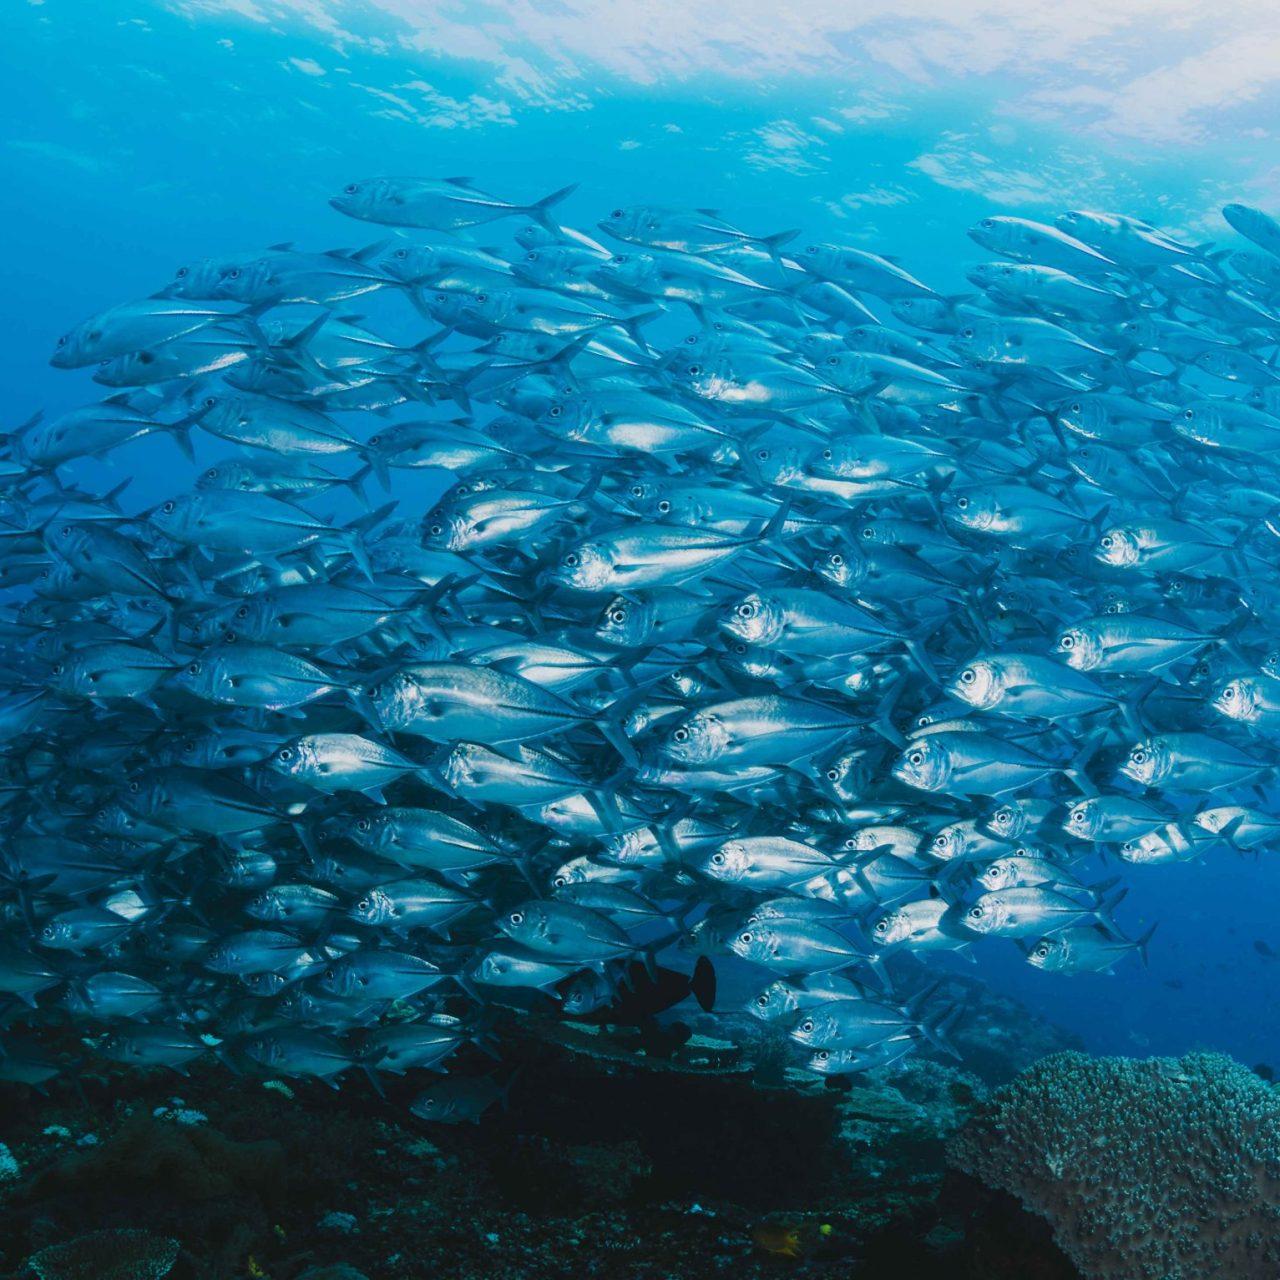 https://i2.wp.com/fossa.systems/wp-content/uploads/2021/05/shoal-of-fish-underwater-scaled.jpg?resize=1280%2C1280&ssl=1